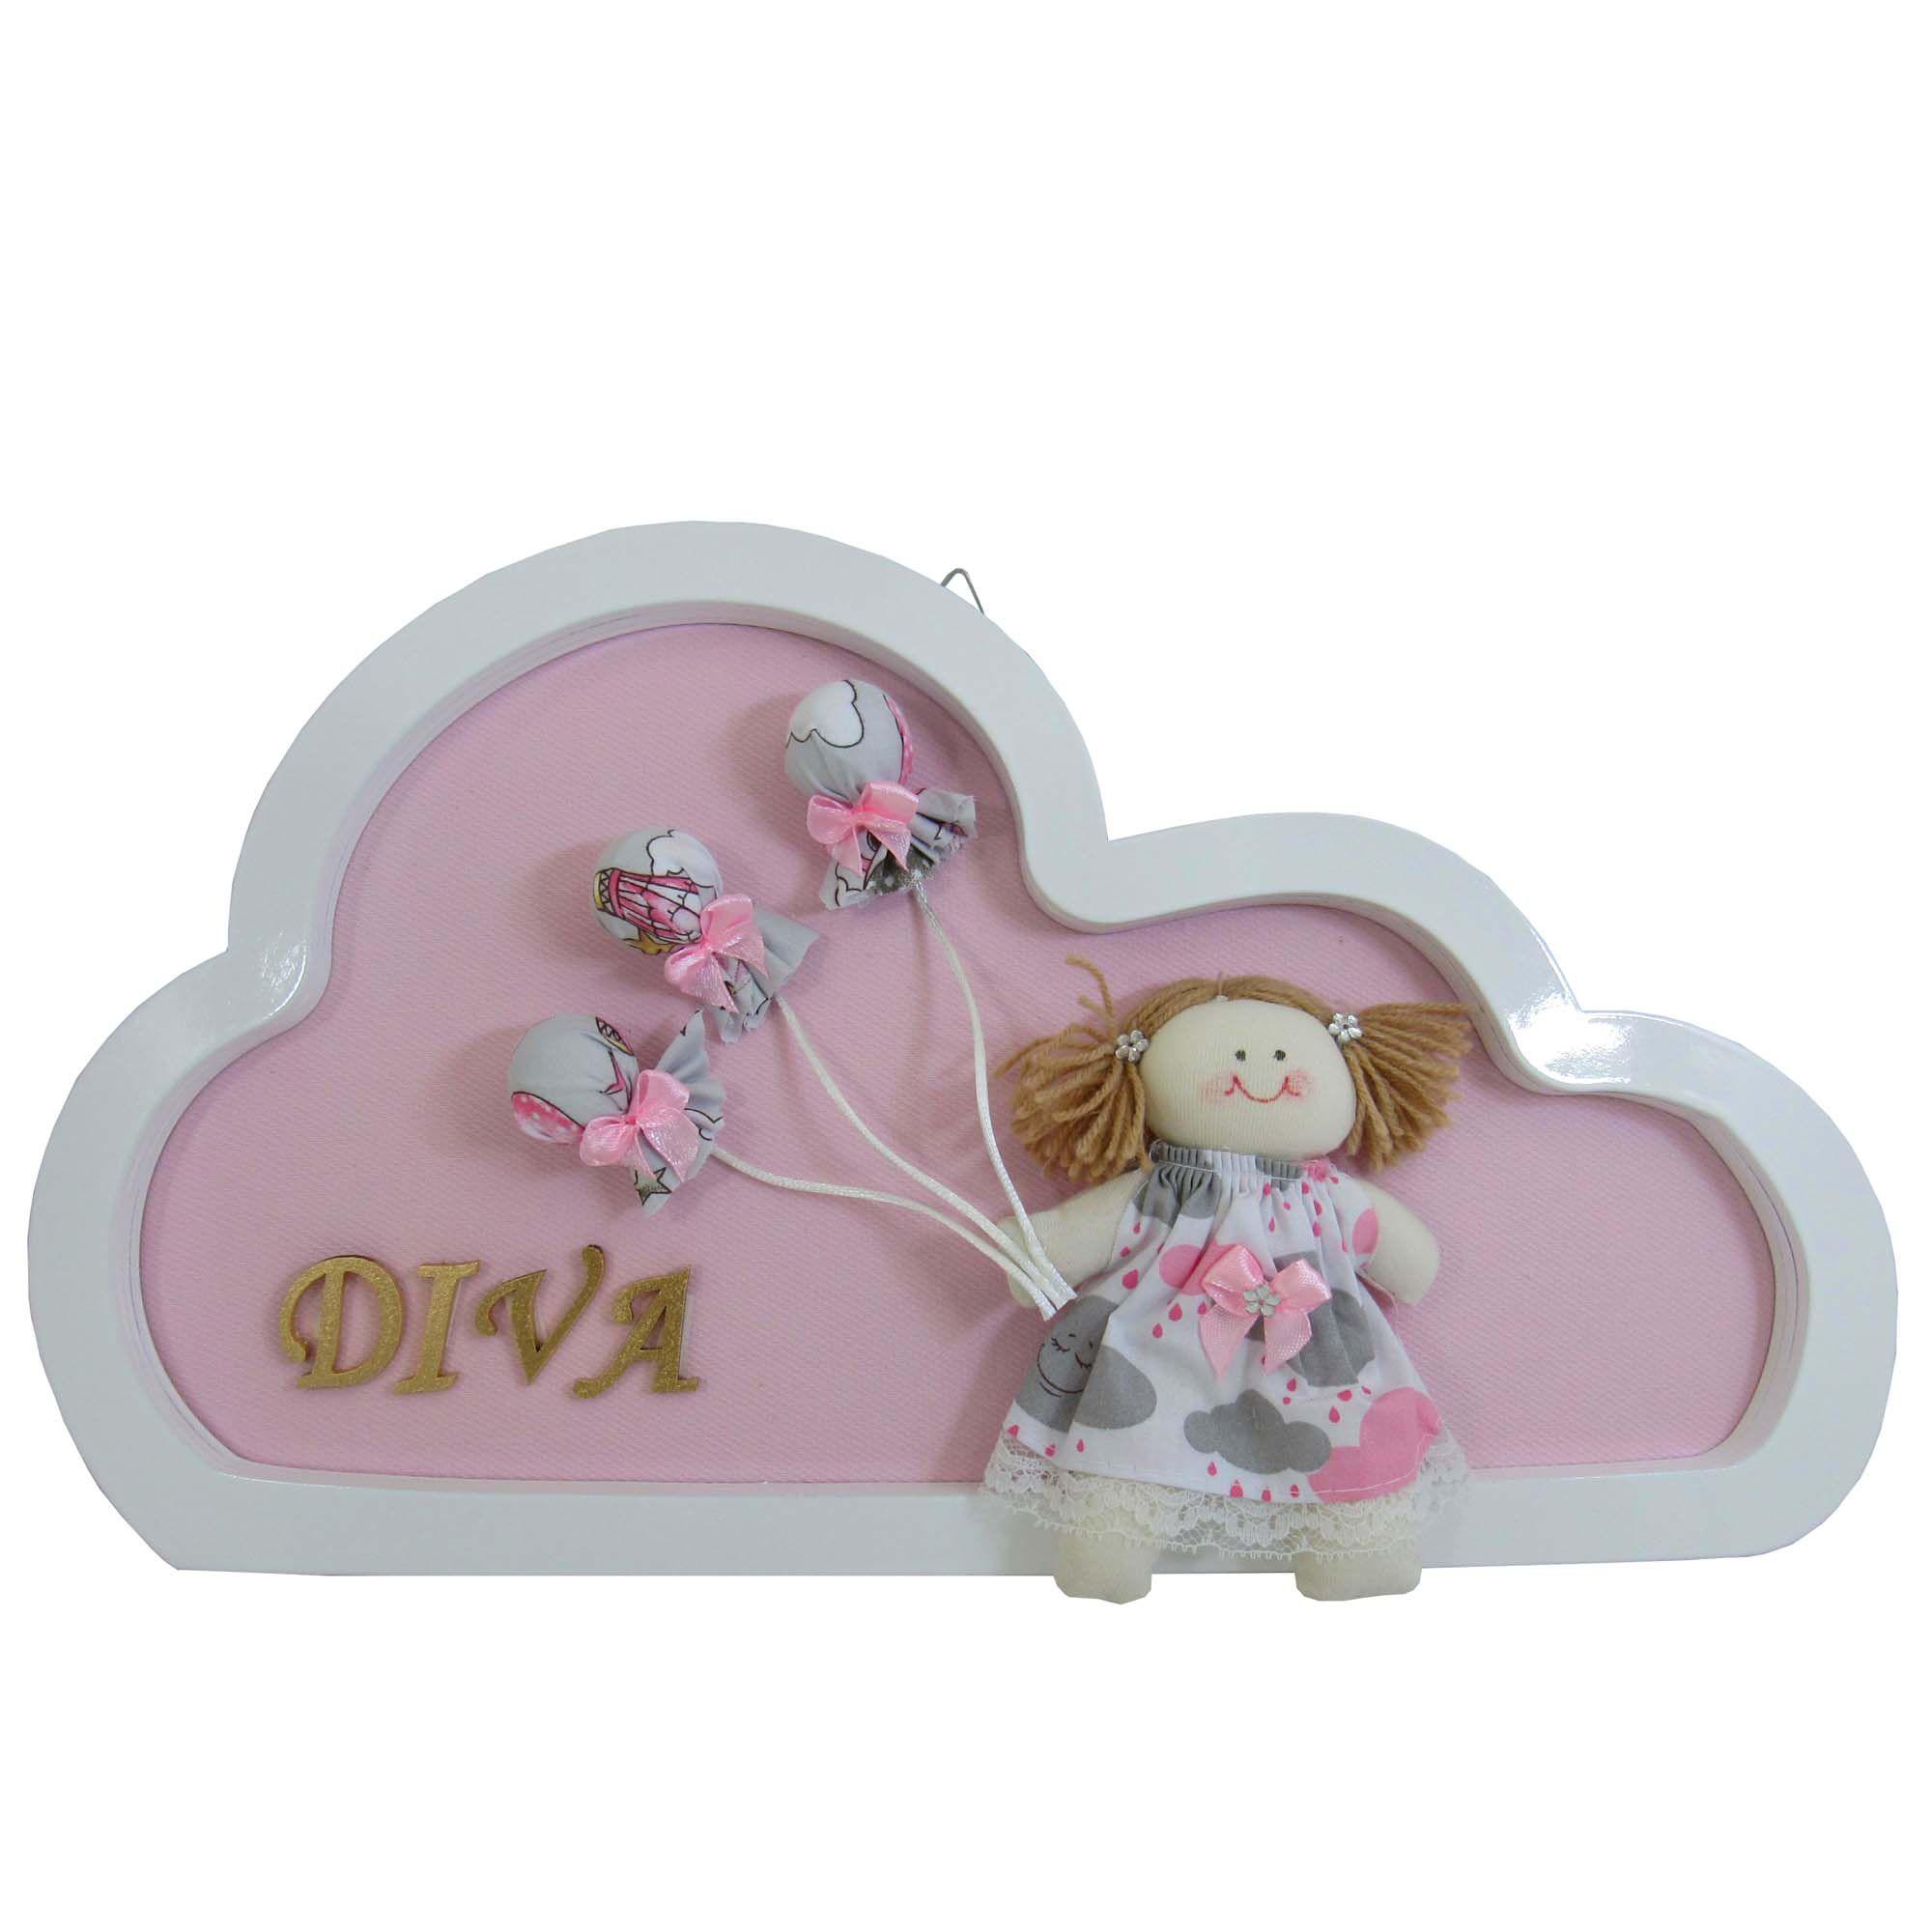 Quadro Porta Maternidade - Nuvem Menina